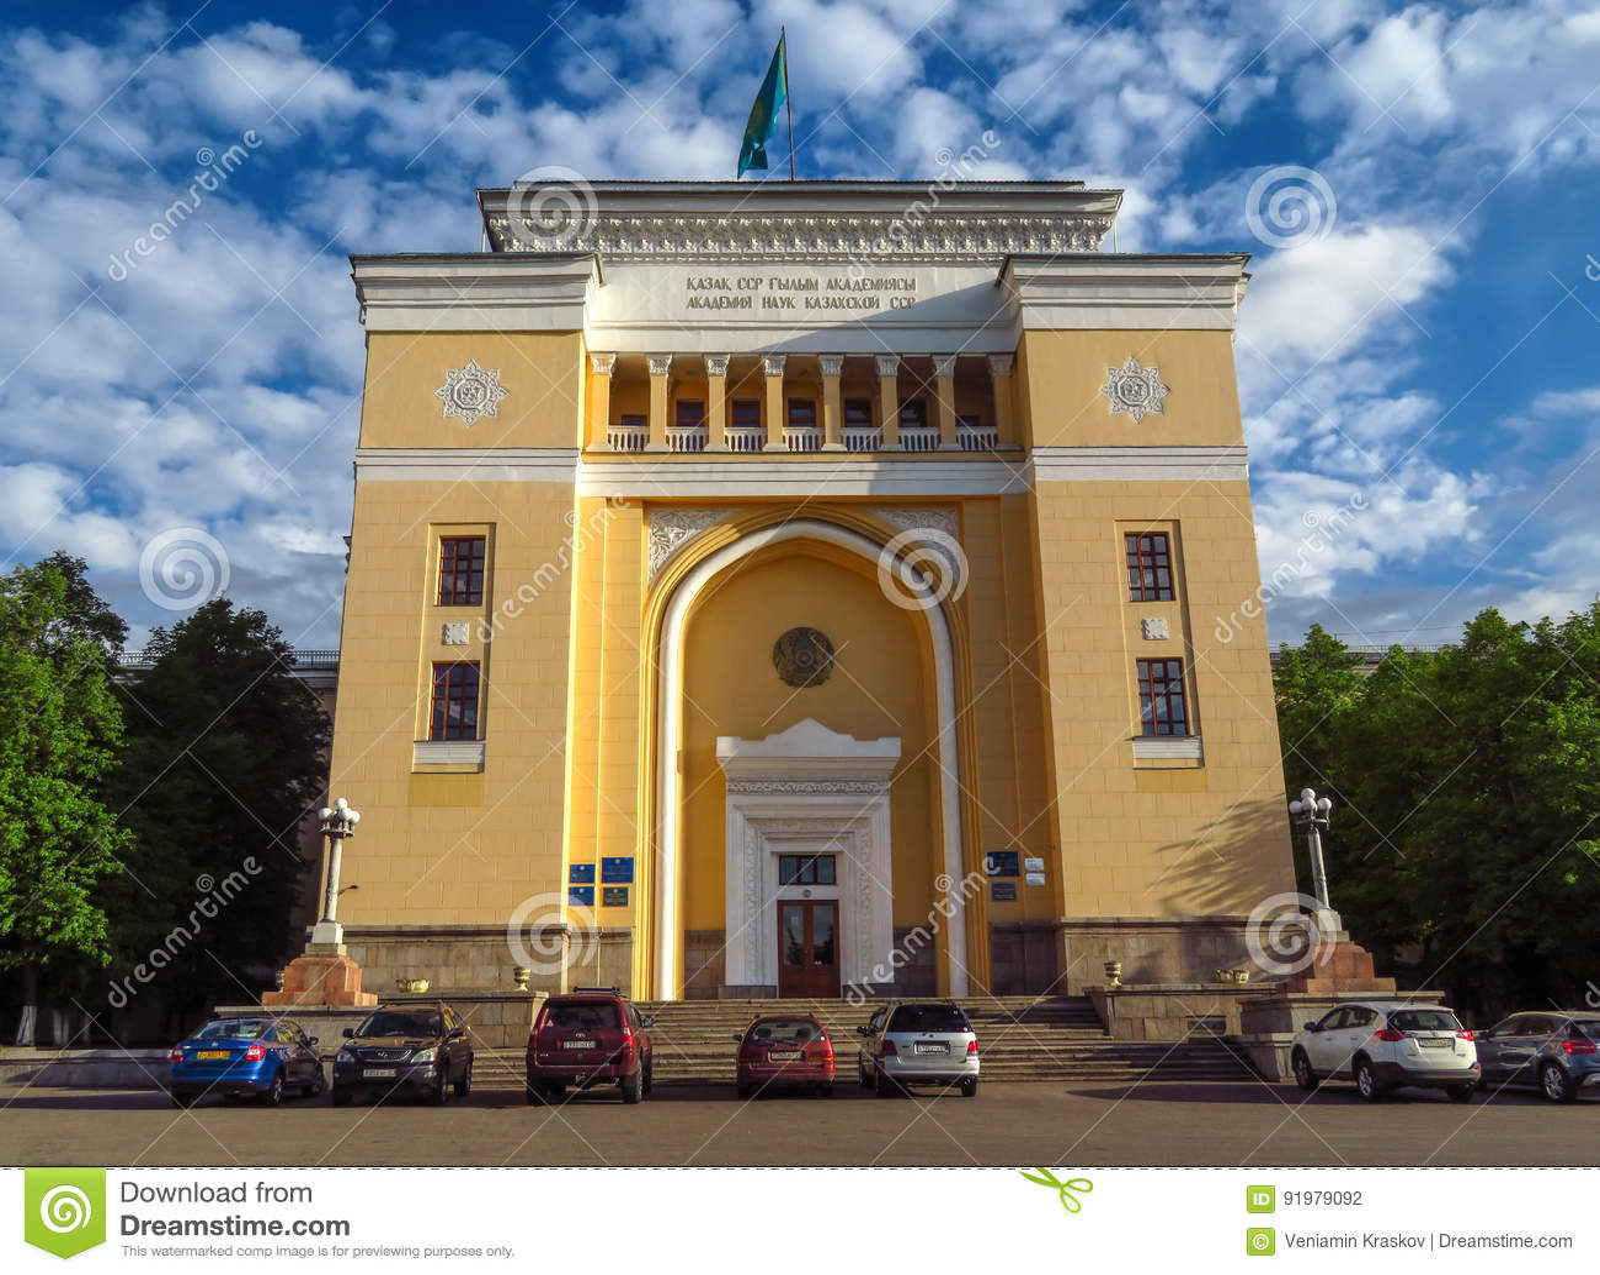 Almaty - National Academy of Sciences